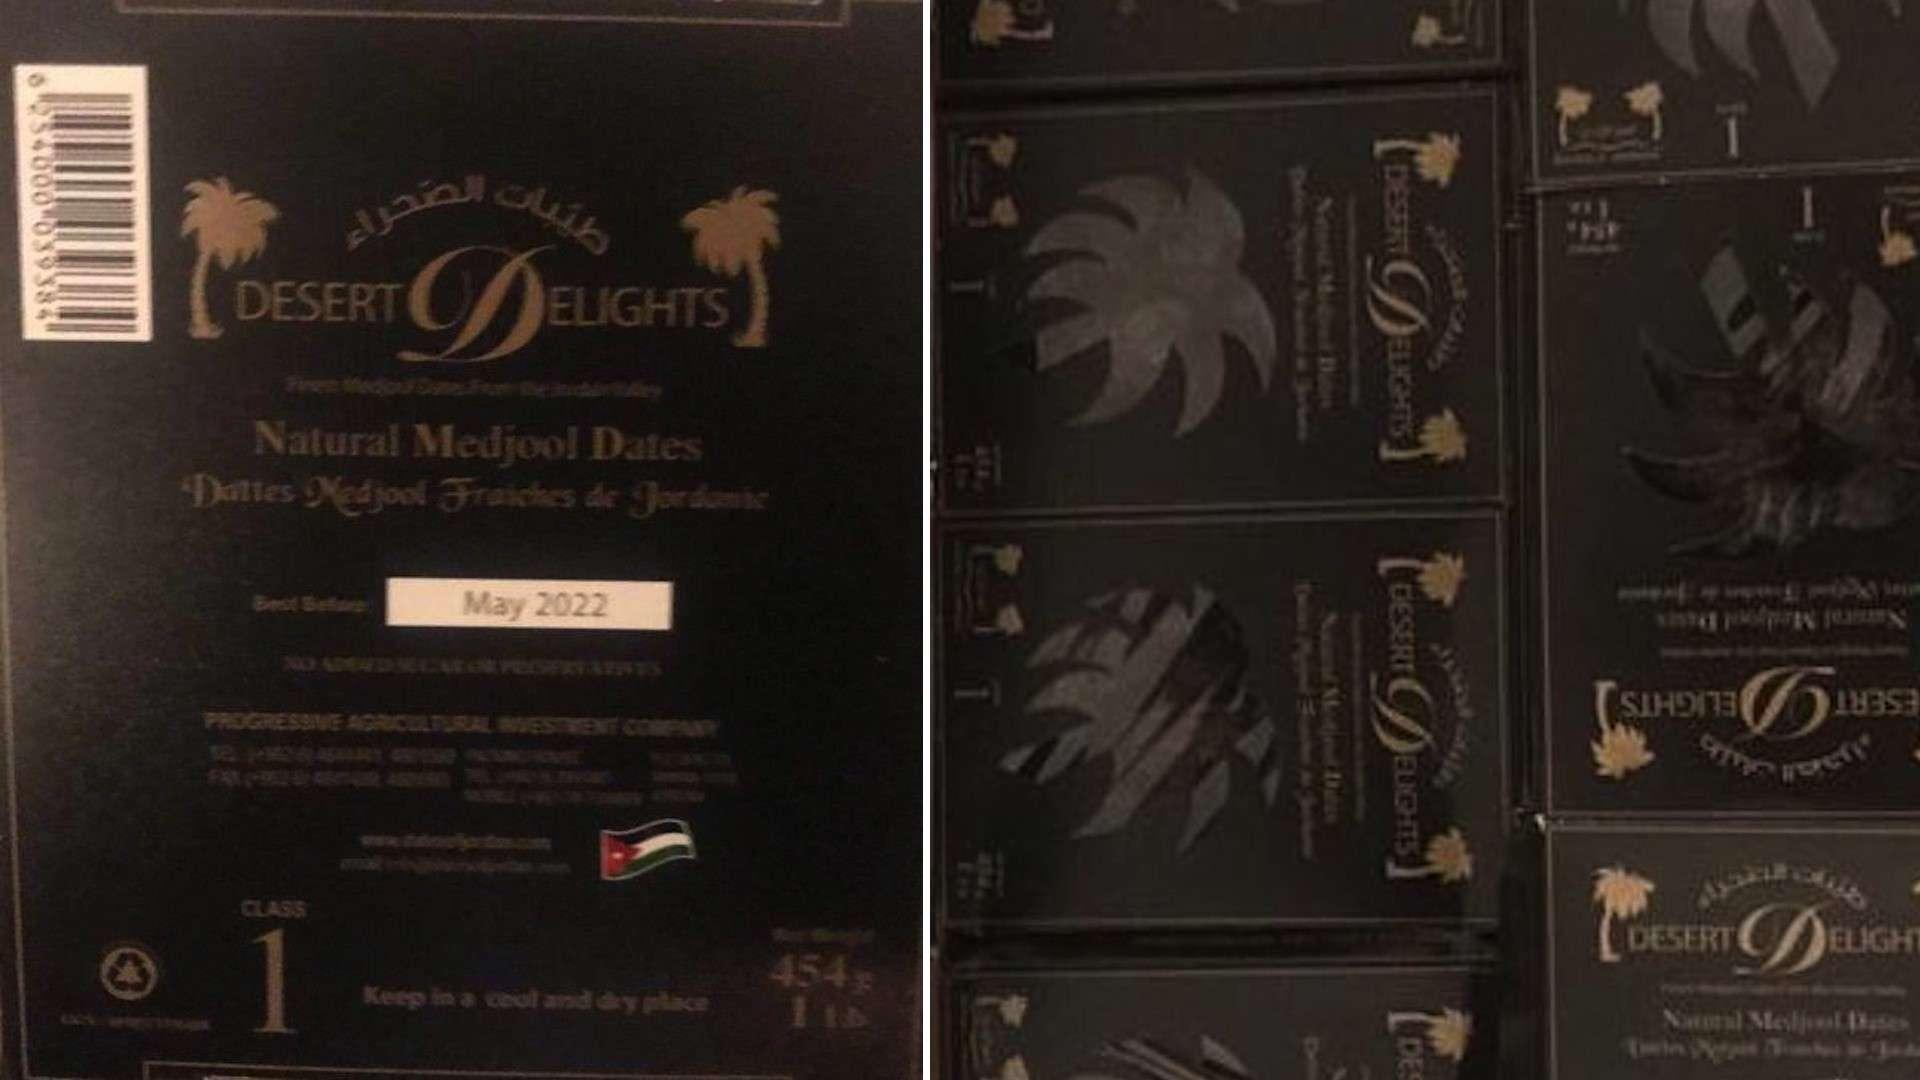 Desert Delights Dates in stock £4.25 per box (0.454g)